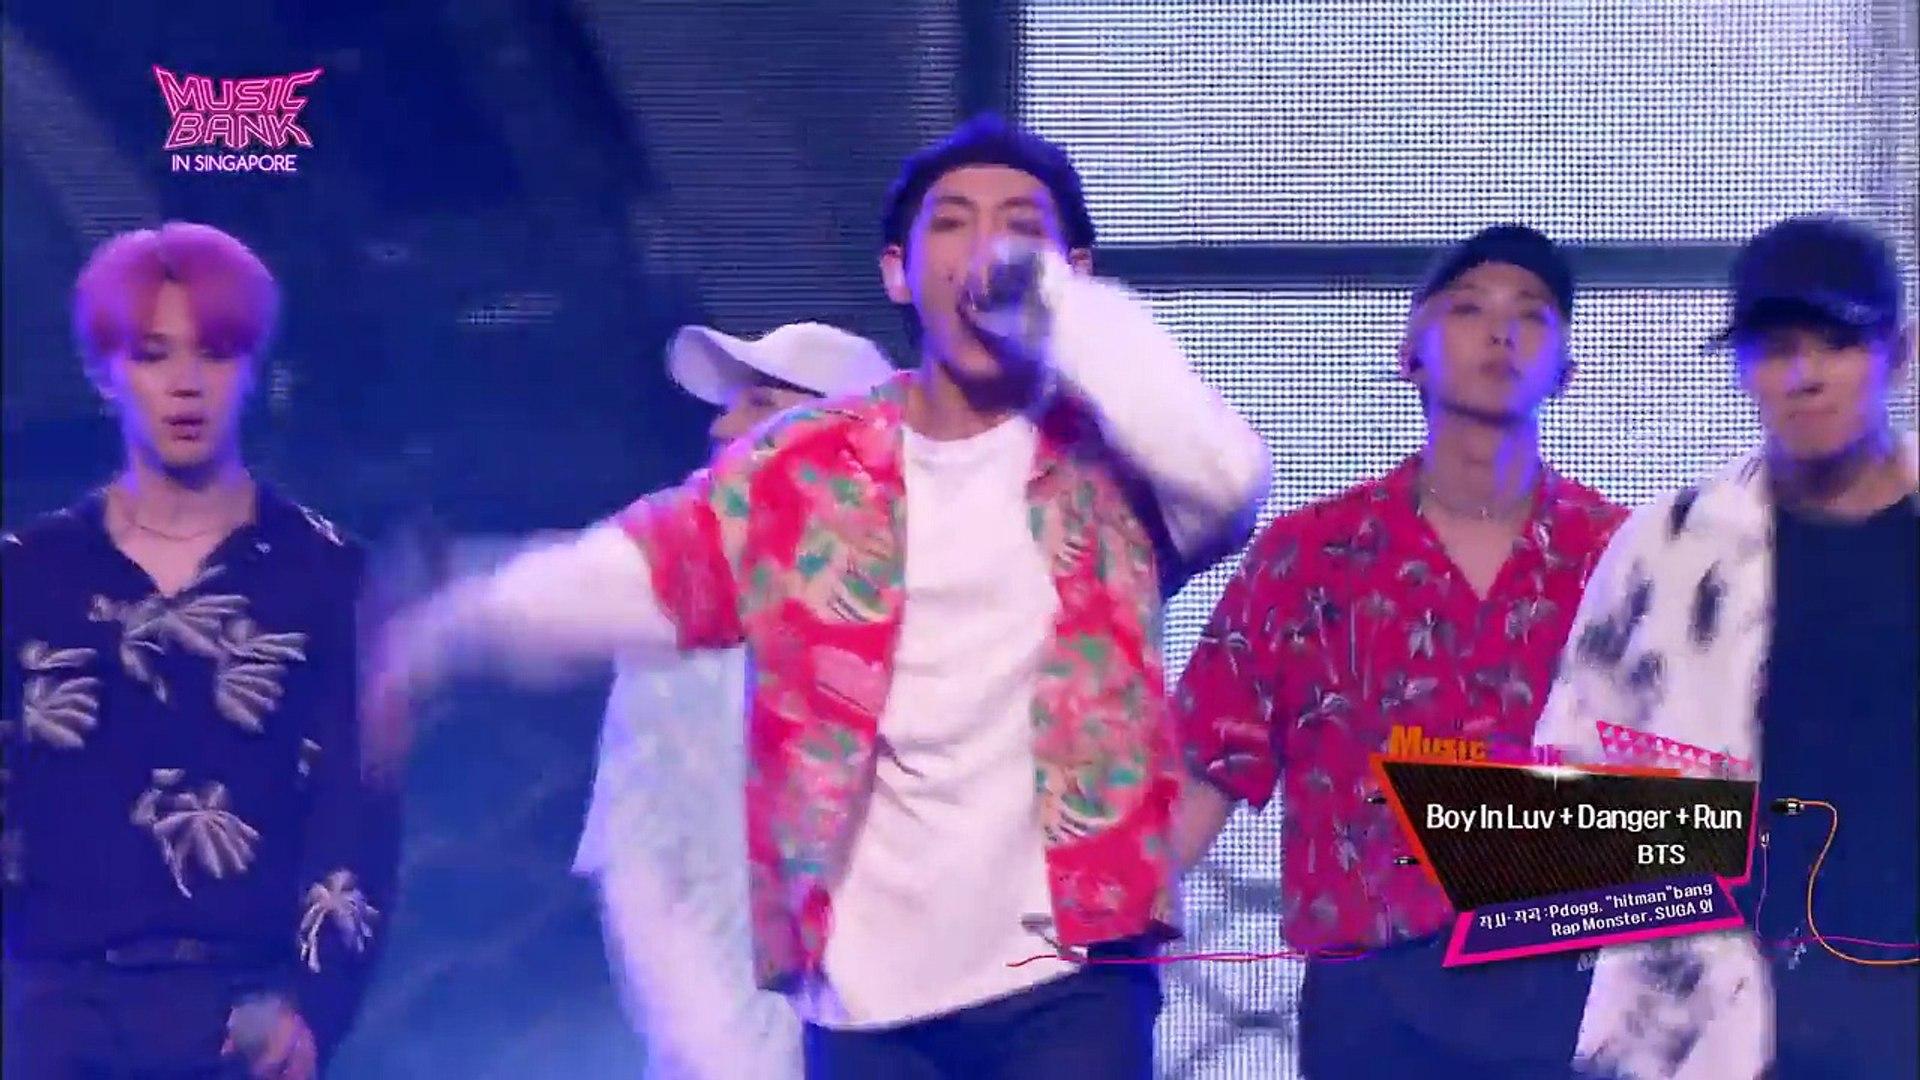 Music Bank - 상남자 + Danger + Run - BTS 방탄소년단 (Boy In Luv + Danger + Run - BTS).20170815